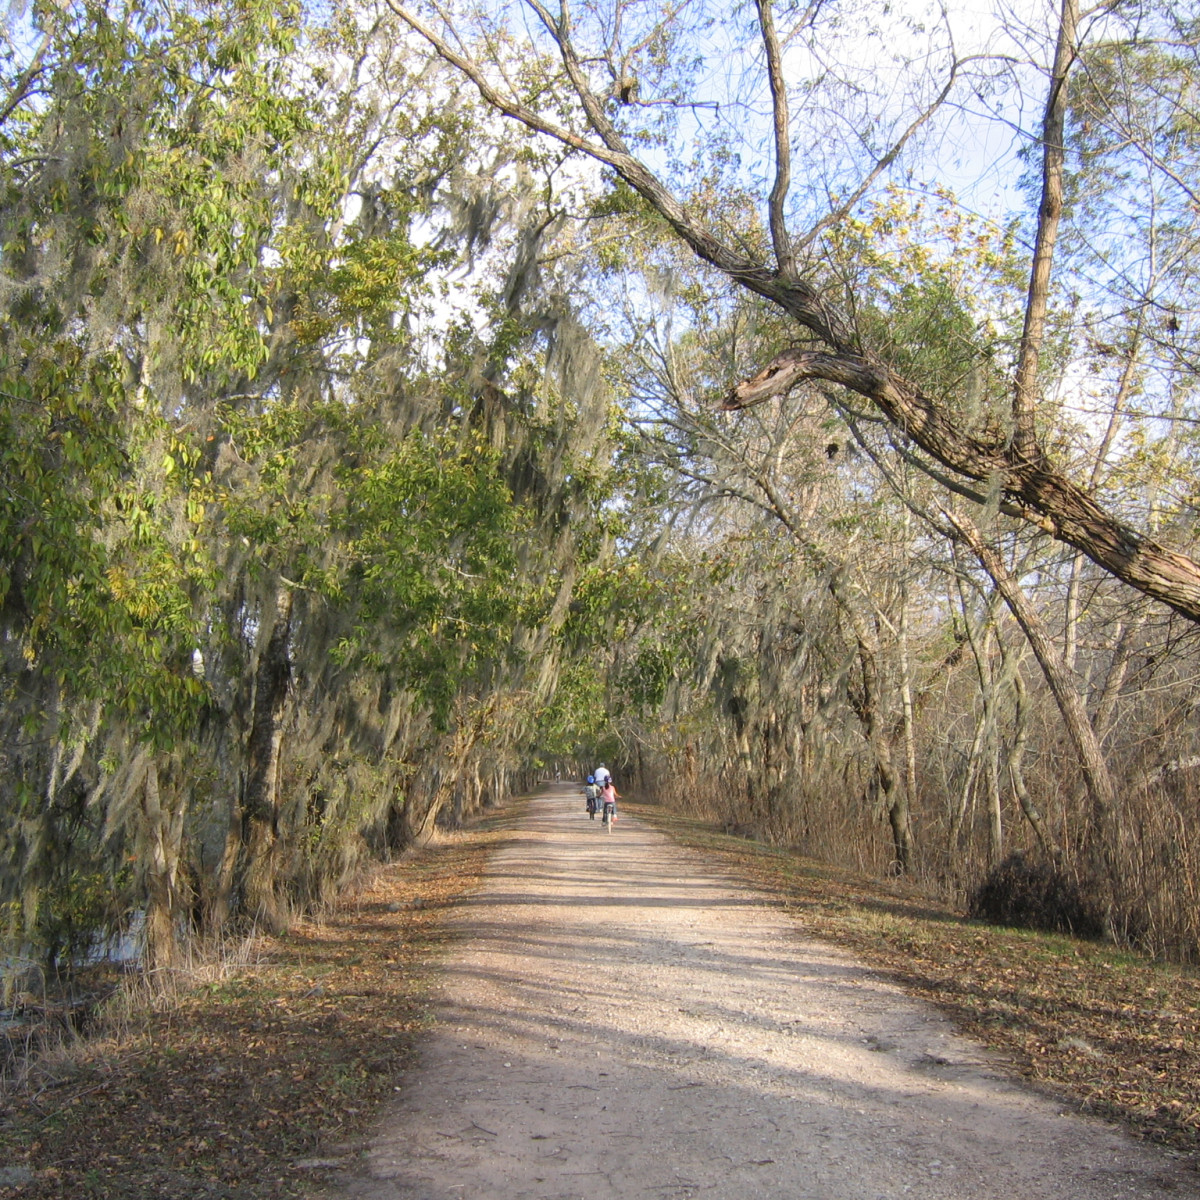 Brazos Bend hiking trail